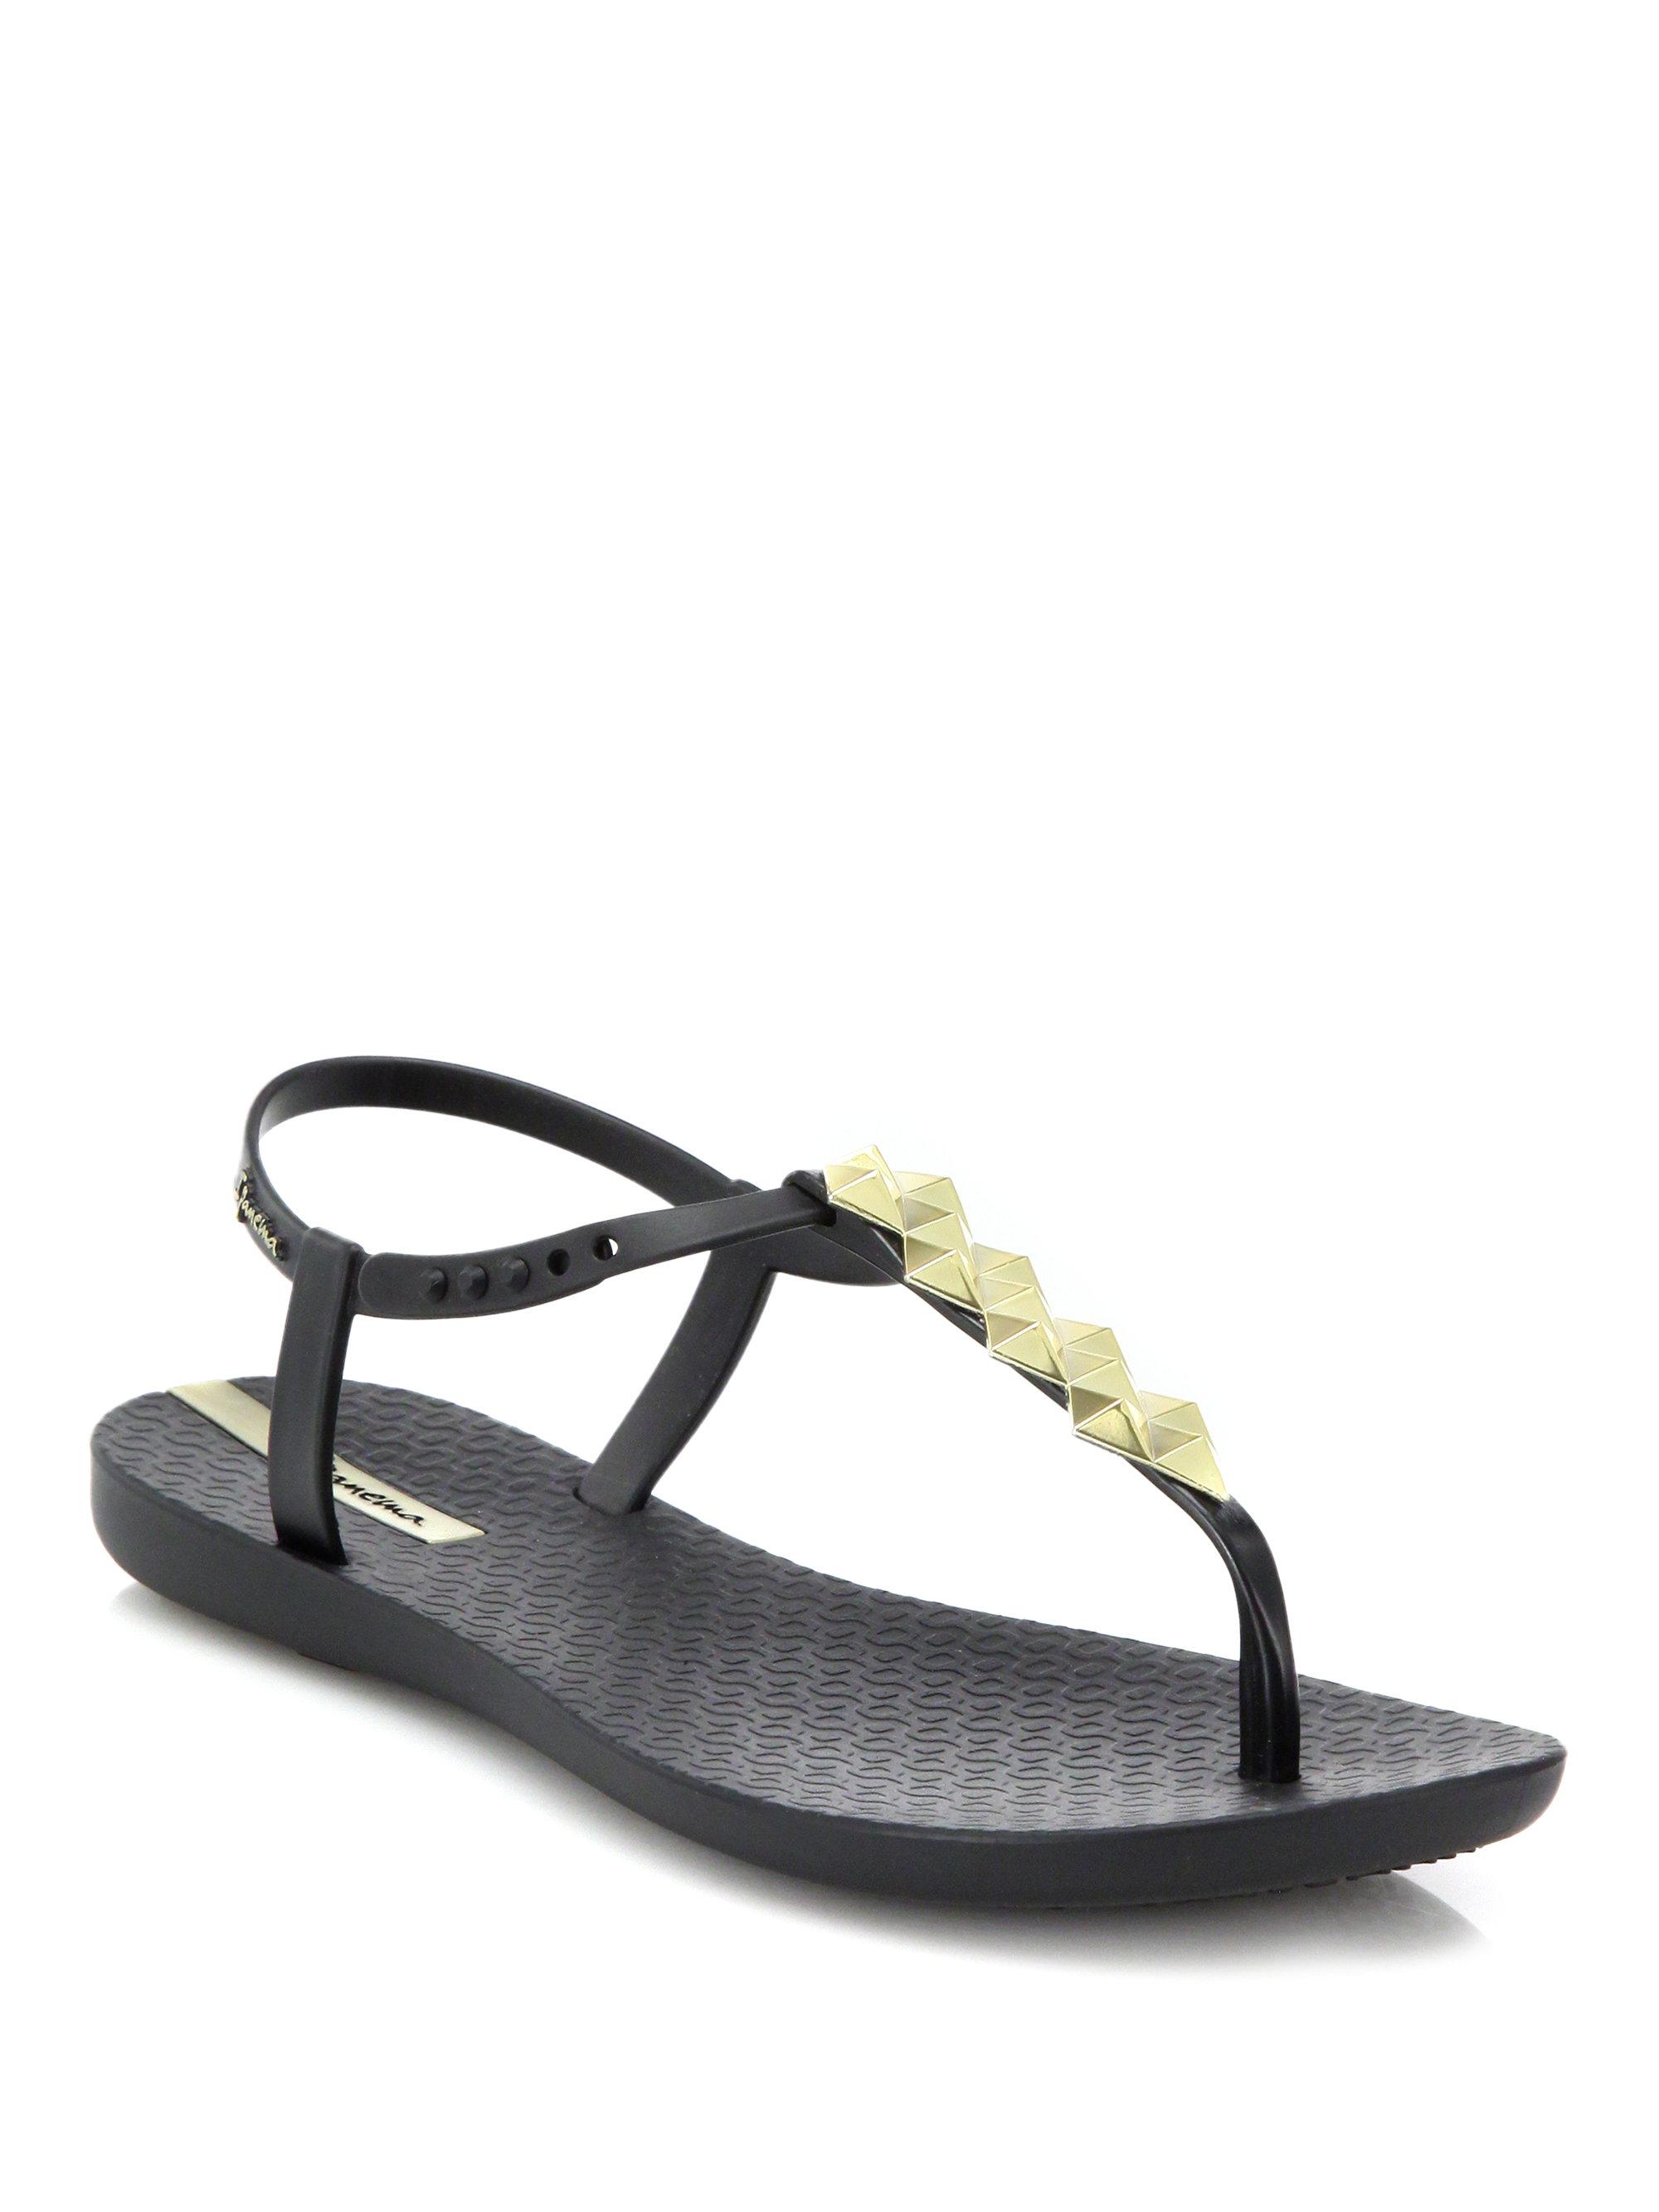 Lyst Ipanema Cleo Shine T Strap Sandals In Black